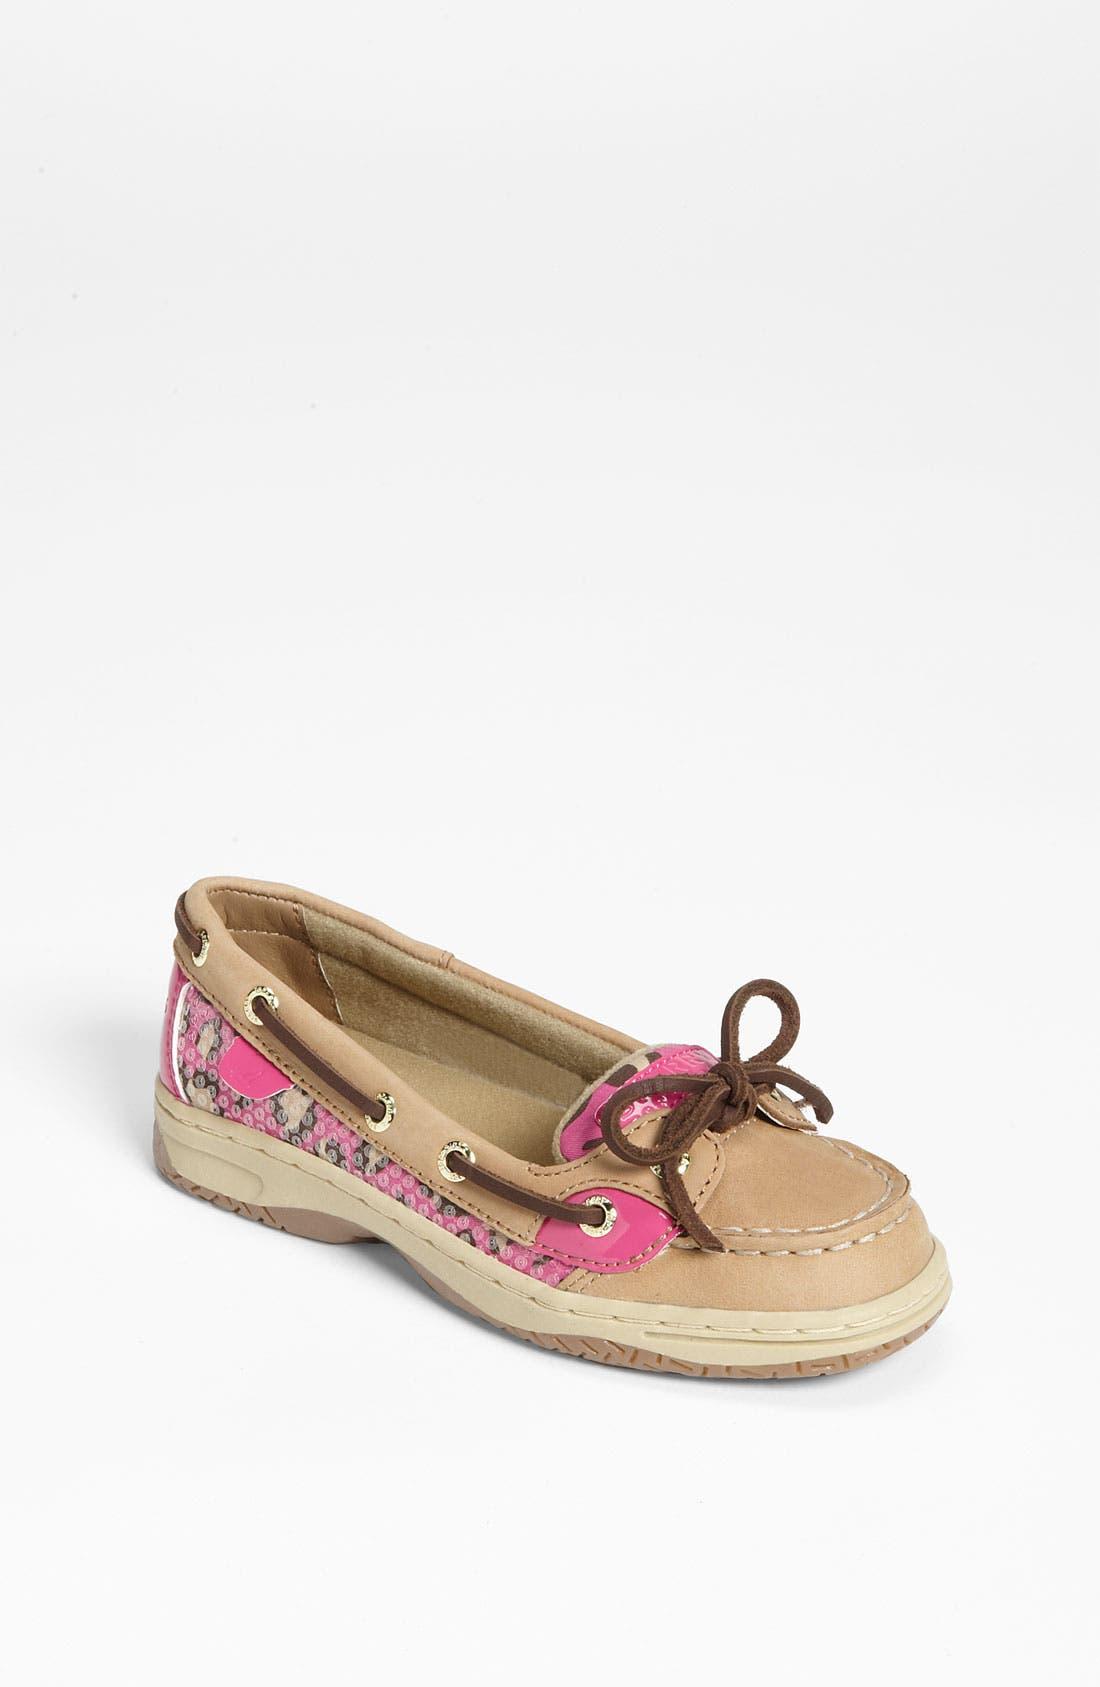 Main Image - Sperry Top-Sider® 'Angelfish' Boat Shoe (Toddler, Little Kid & Big Kid)